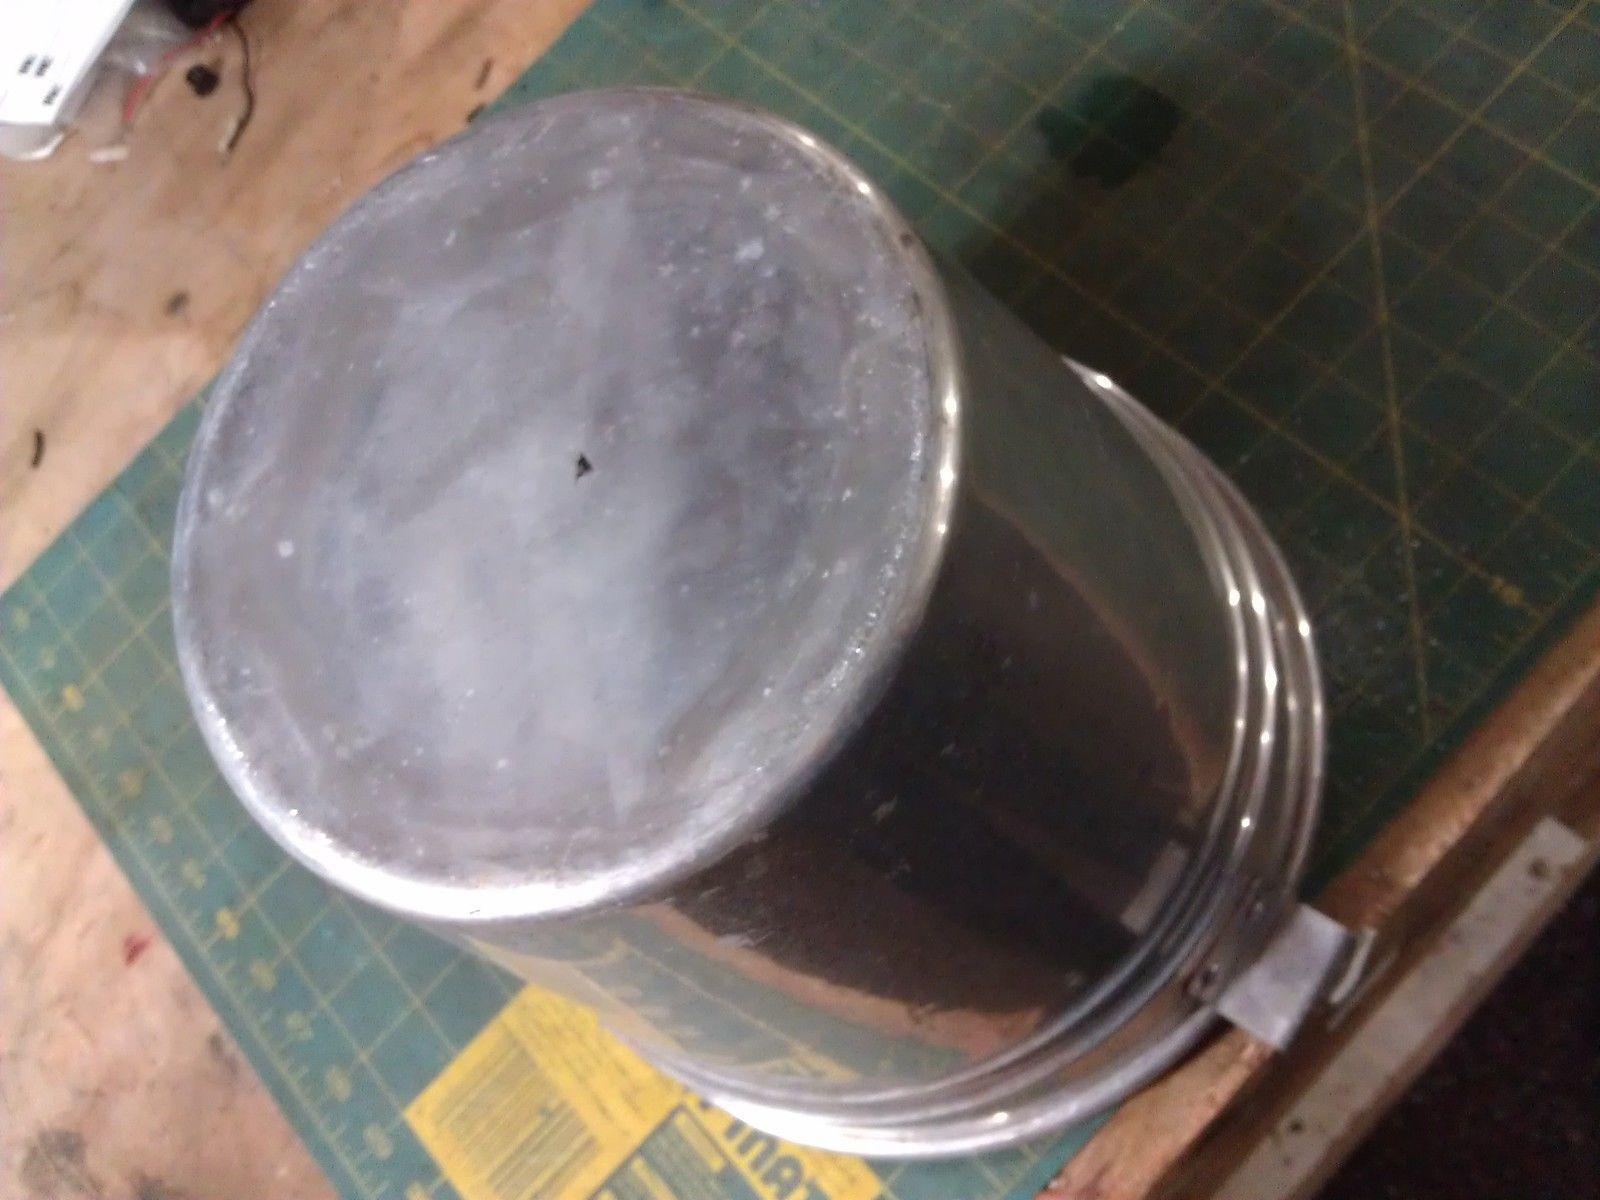 6JJ45 ALUMINUM PAIL, FROM ICE CREAM FREEZER, GOOD CONDITION image 3